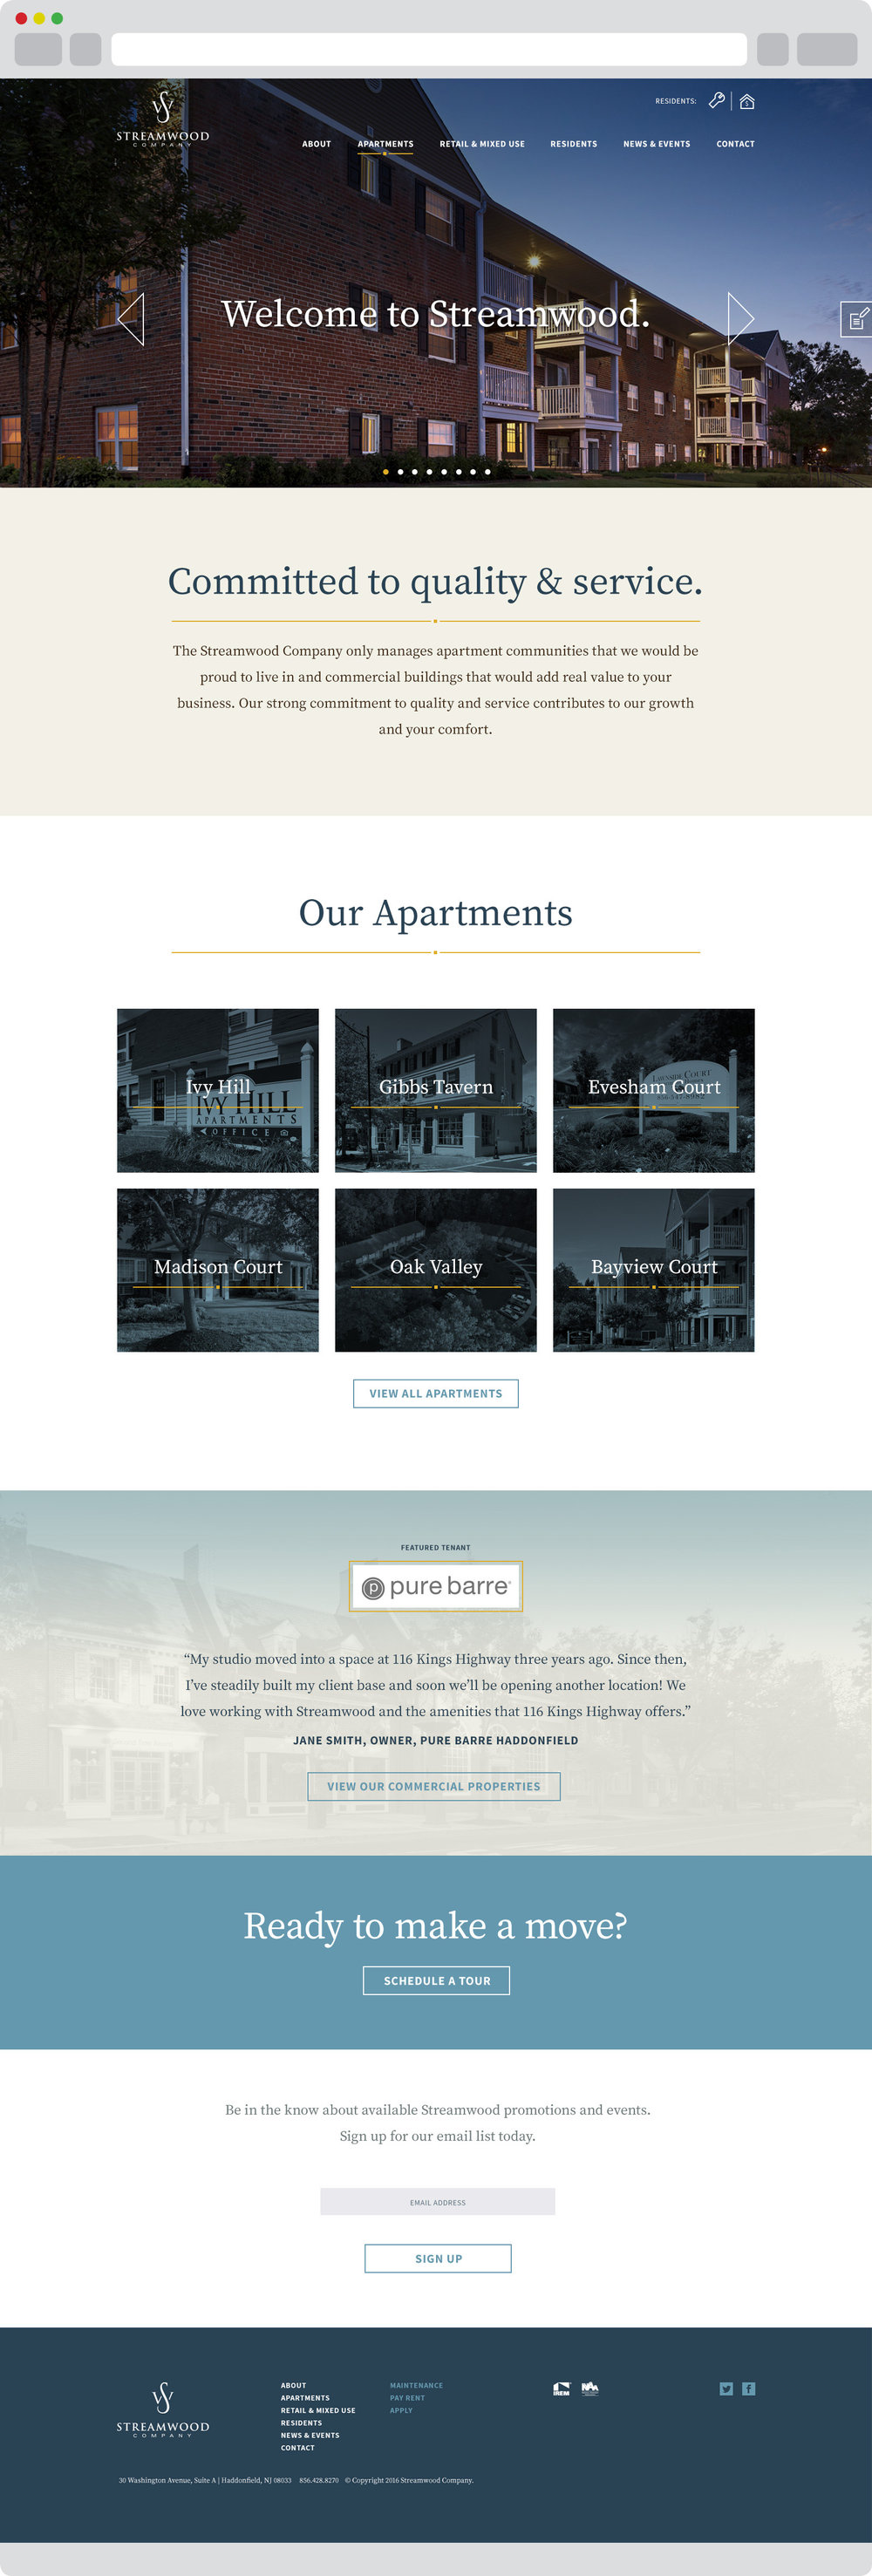 julierado-streamwood-home-flat-browser-mockup-fs.jpg